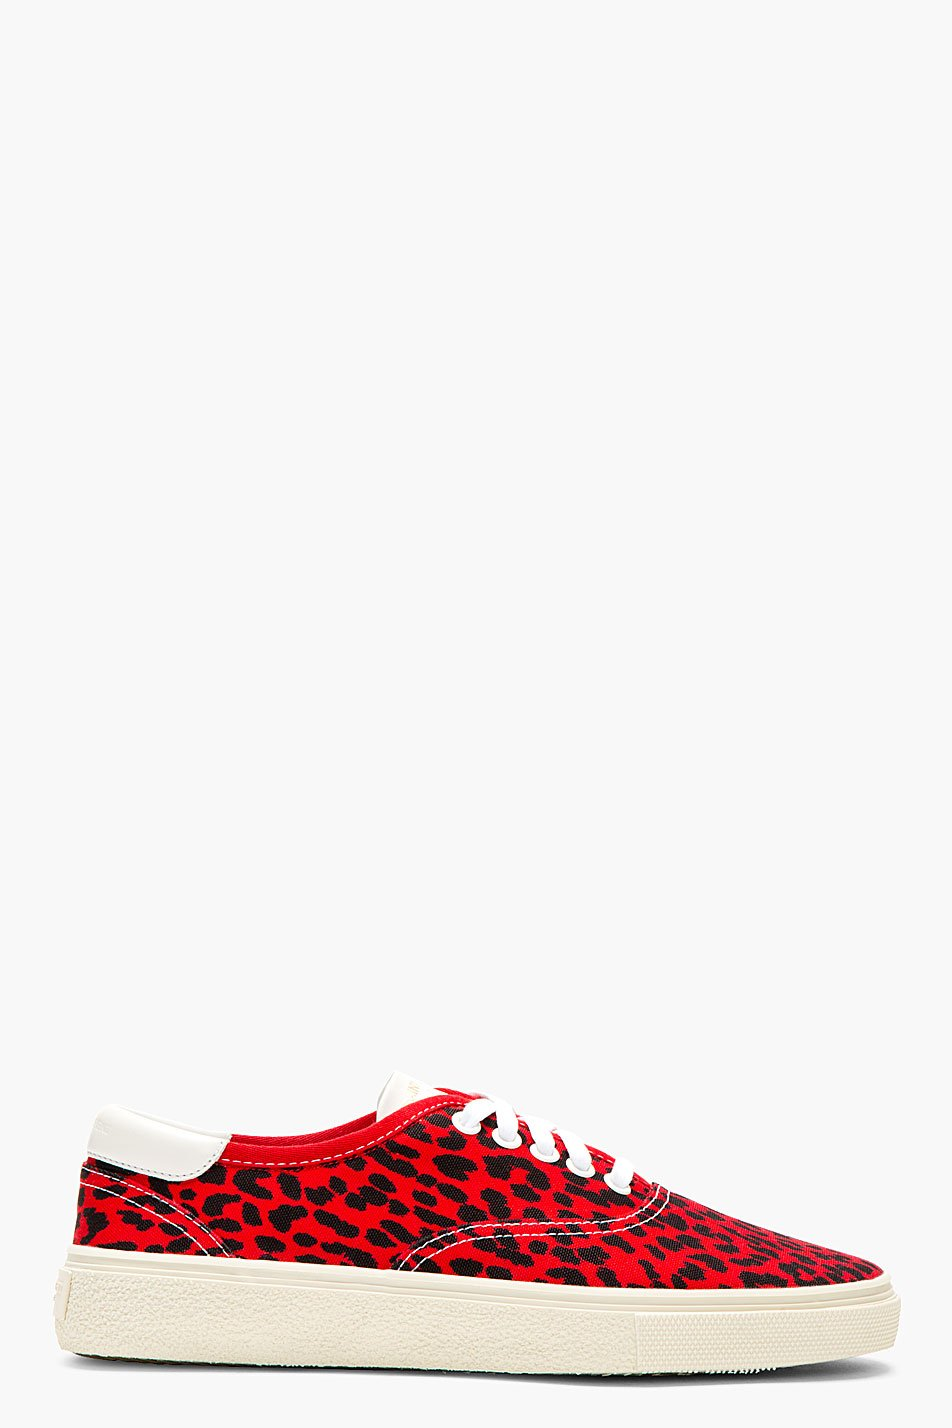 Saint Laurent Red Babycat Lace Up Sneakers